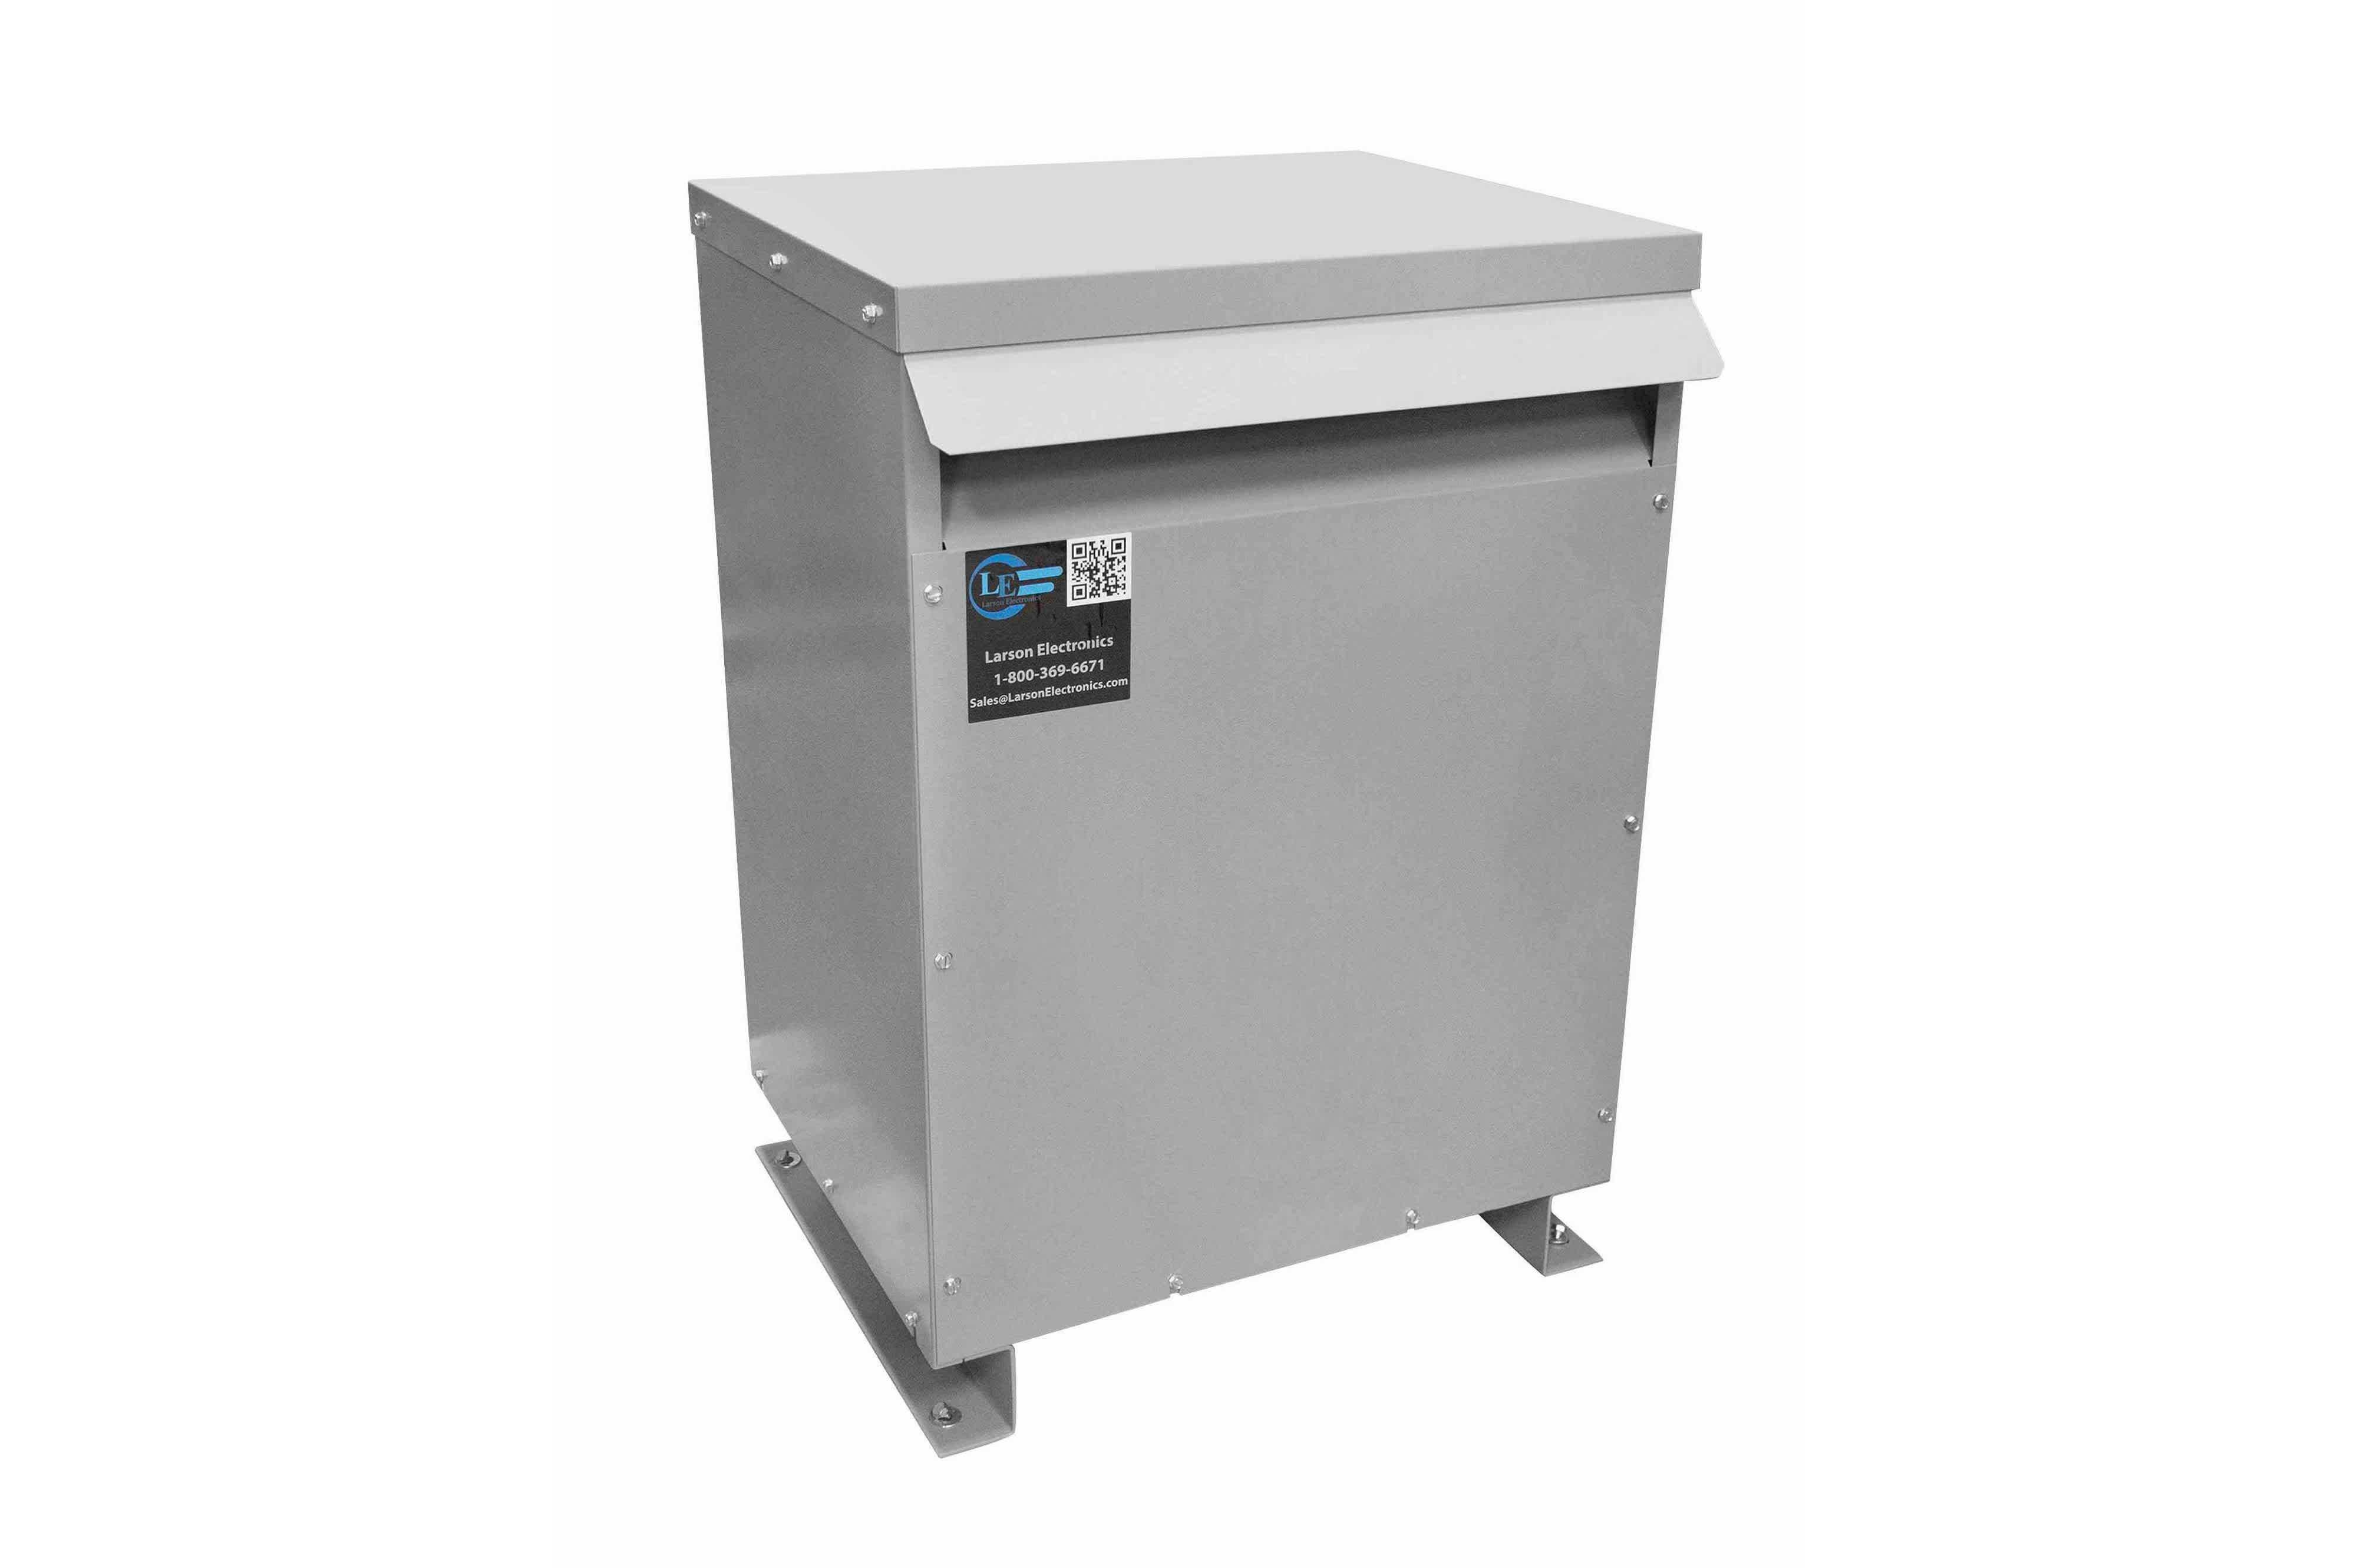 60 kVA 3PH DOE Transformer, 220V Delta Primary, 208Y/120 Wye-N Secondary, N3R, Ventilated, 60 Hz